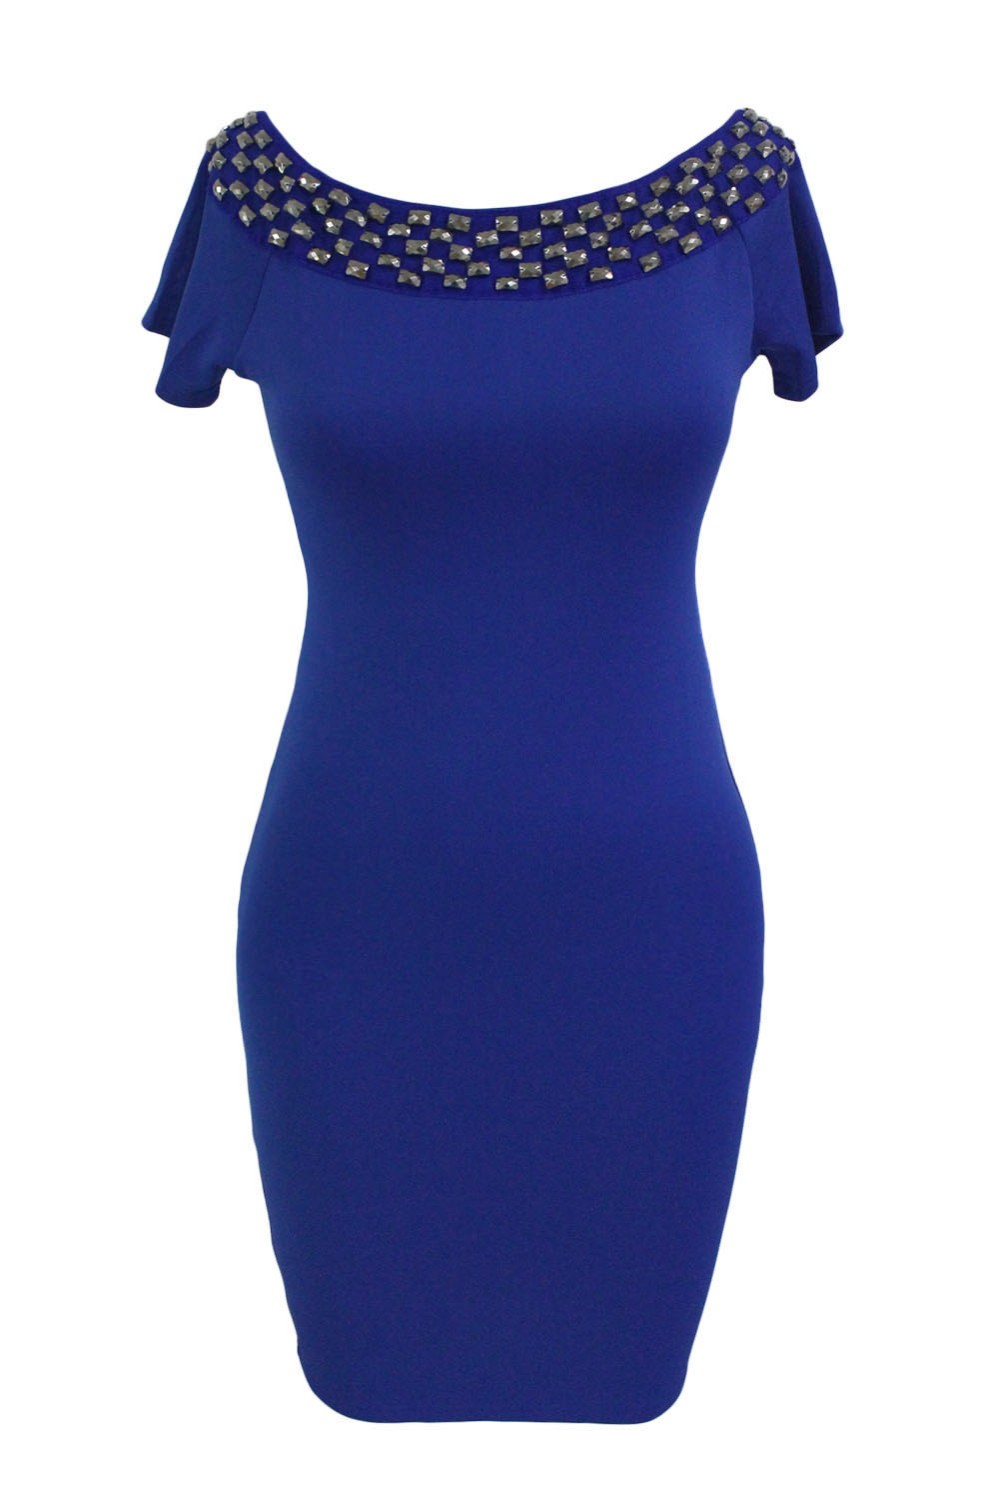 Studded-Off-Shoulder-Blue-Short-Sleeve-Bodycon-Dress-LC61188-5-2